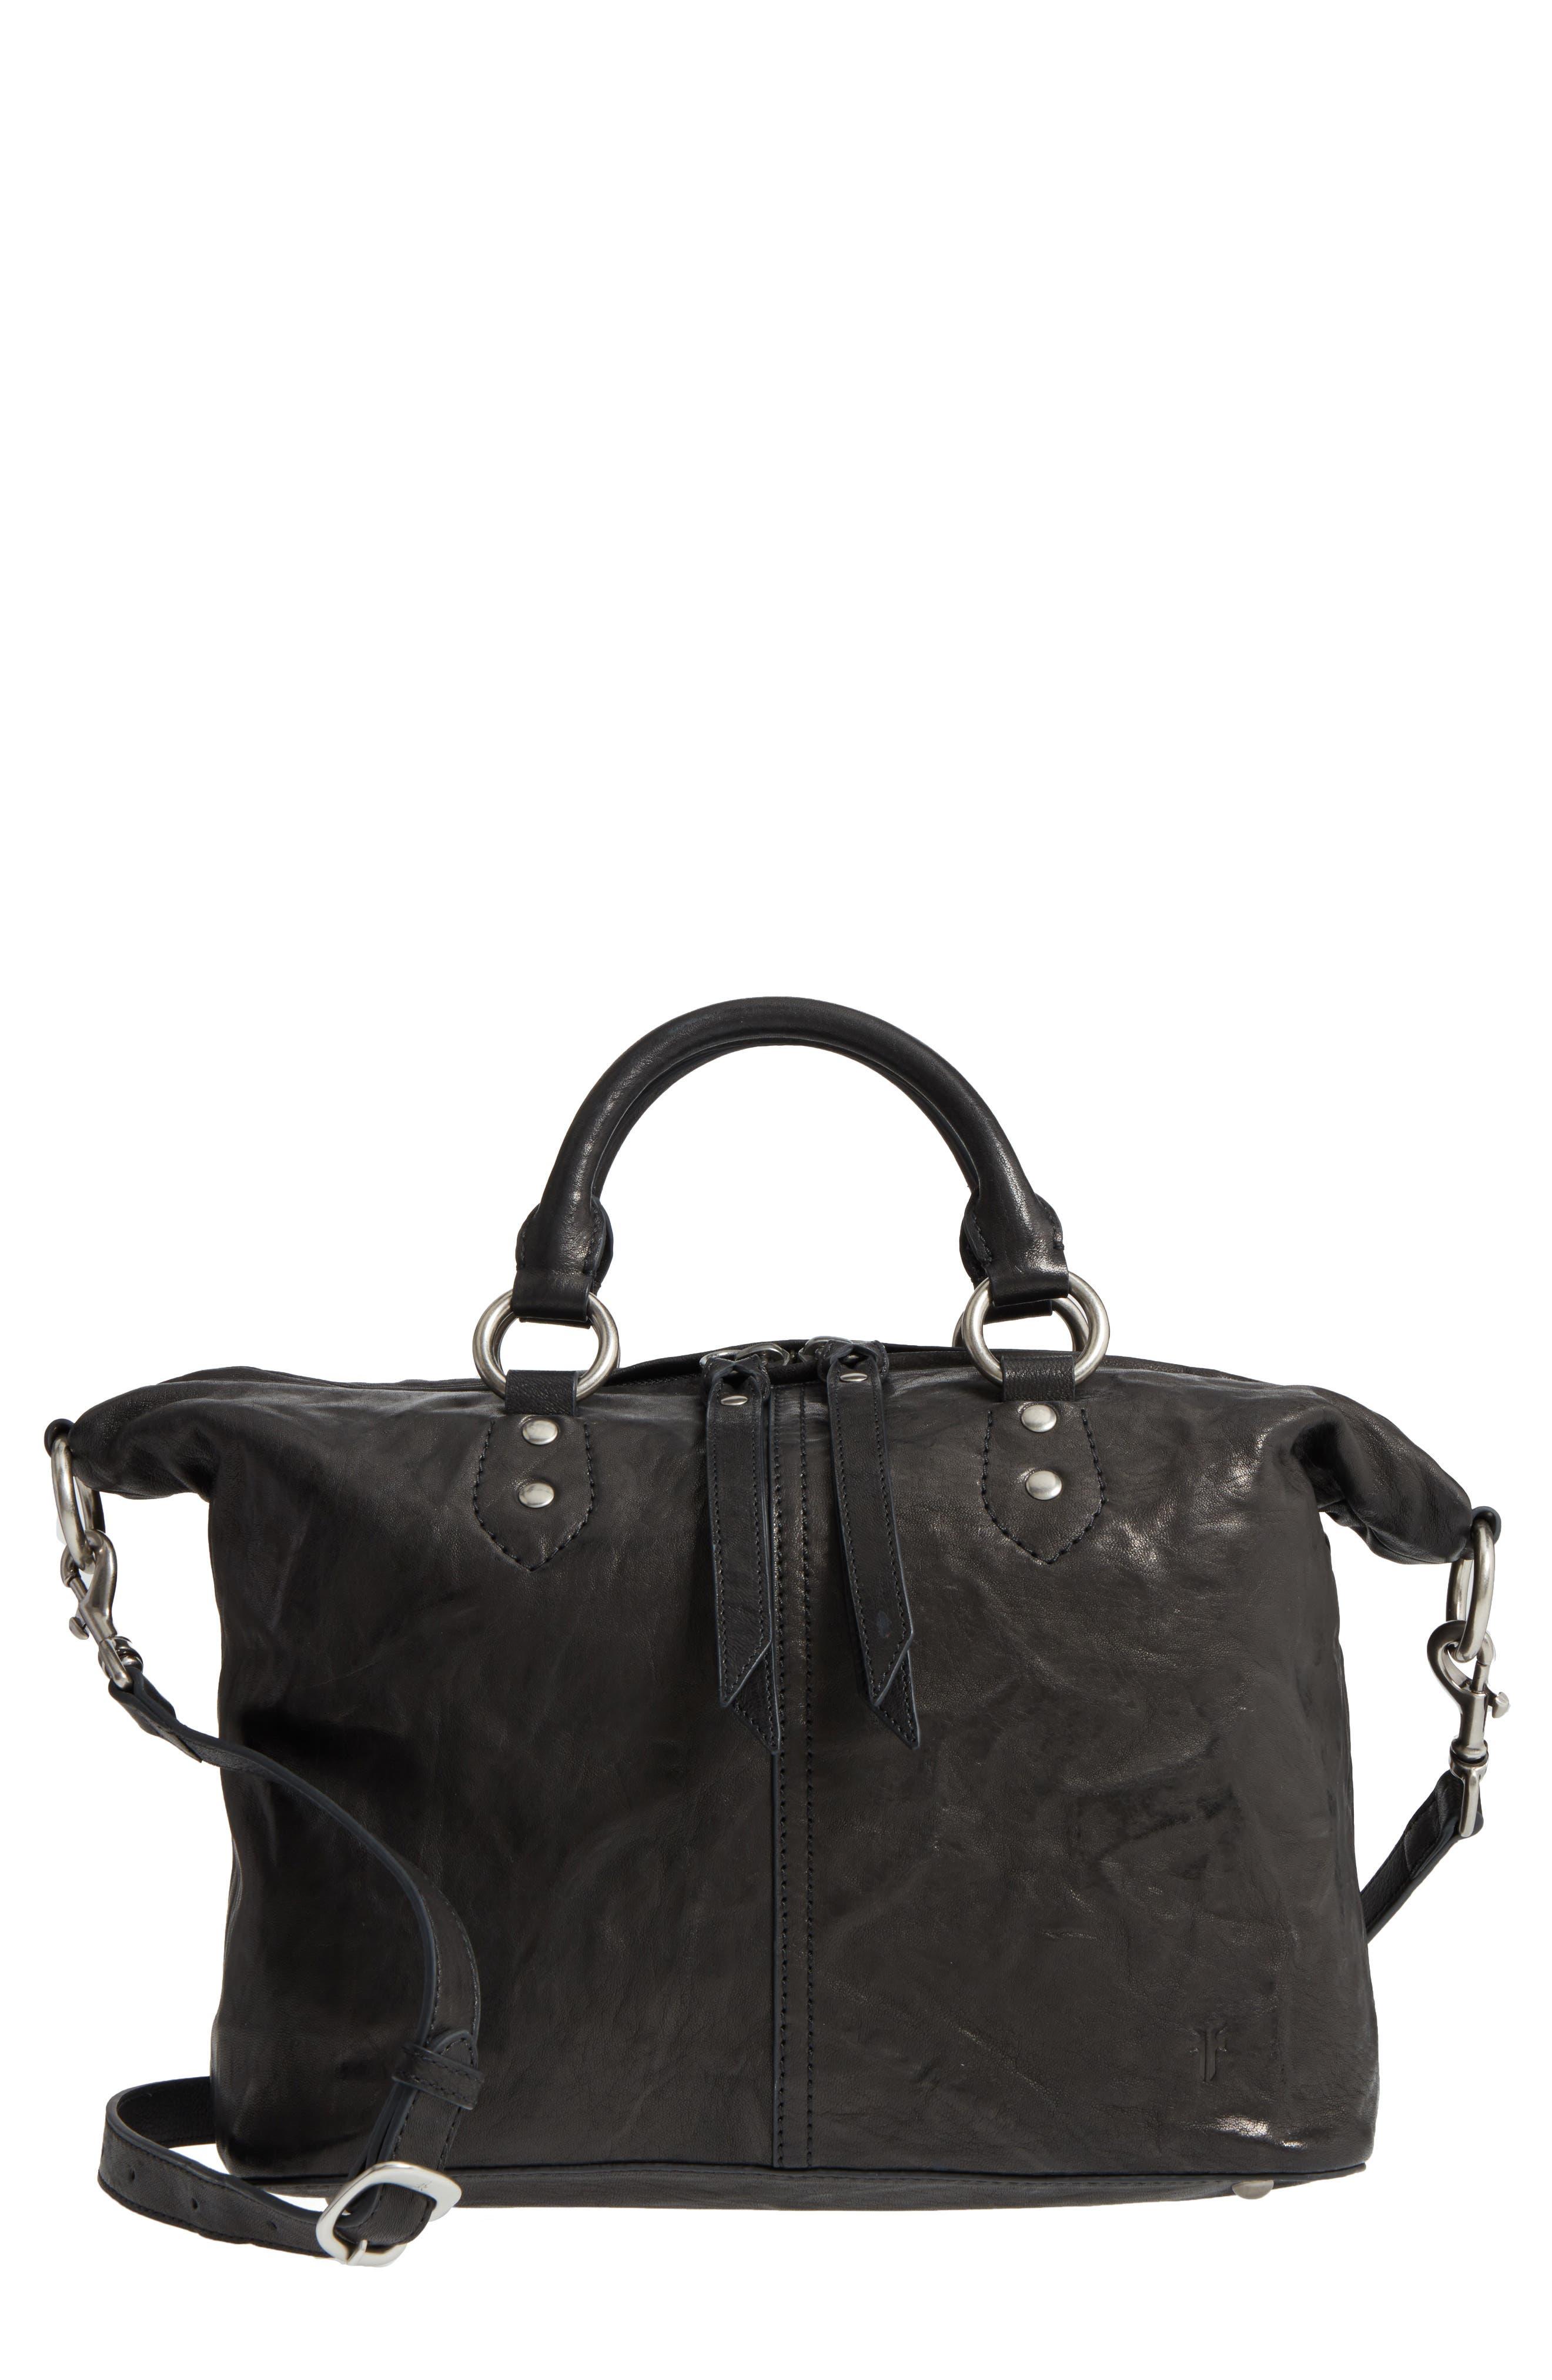 Veronica Sheepskin Leather Satchel,                         Main,                         color, 001